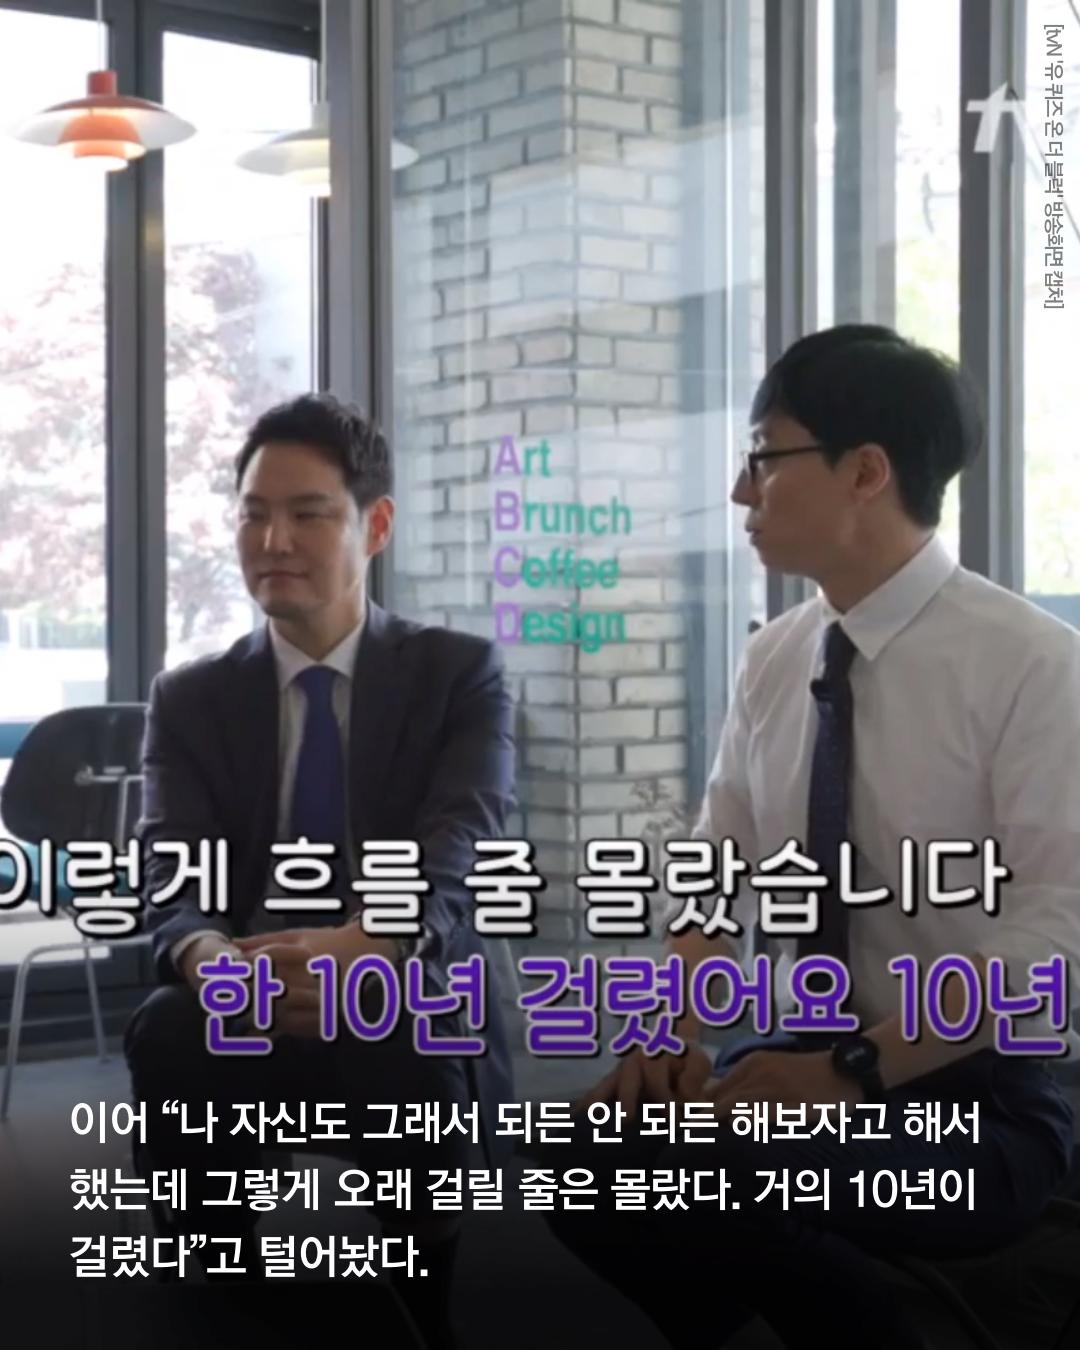 9.png 유재석이 10년간 끈질기게 소송을 한 이유..